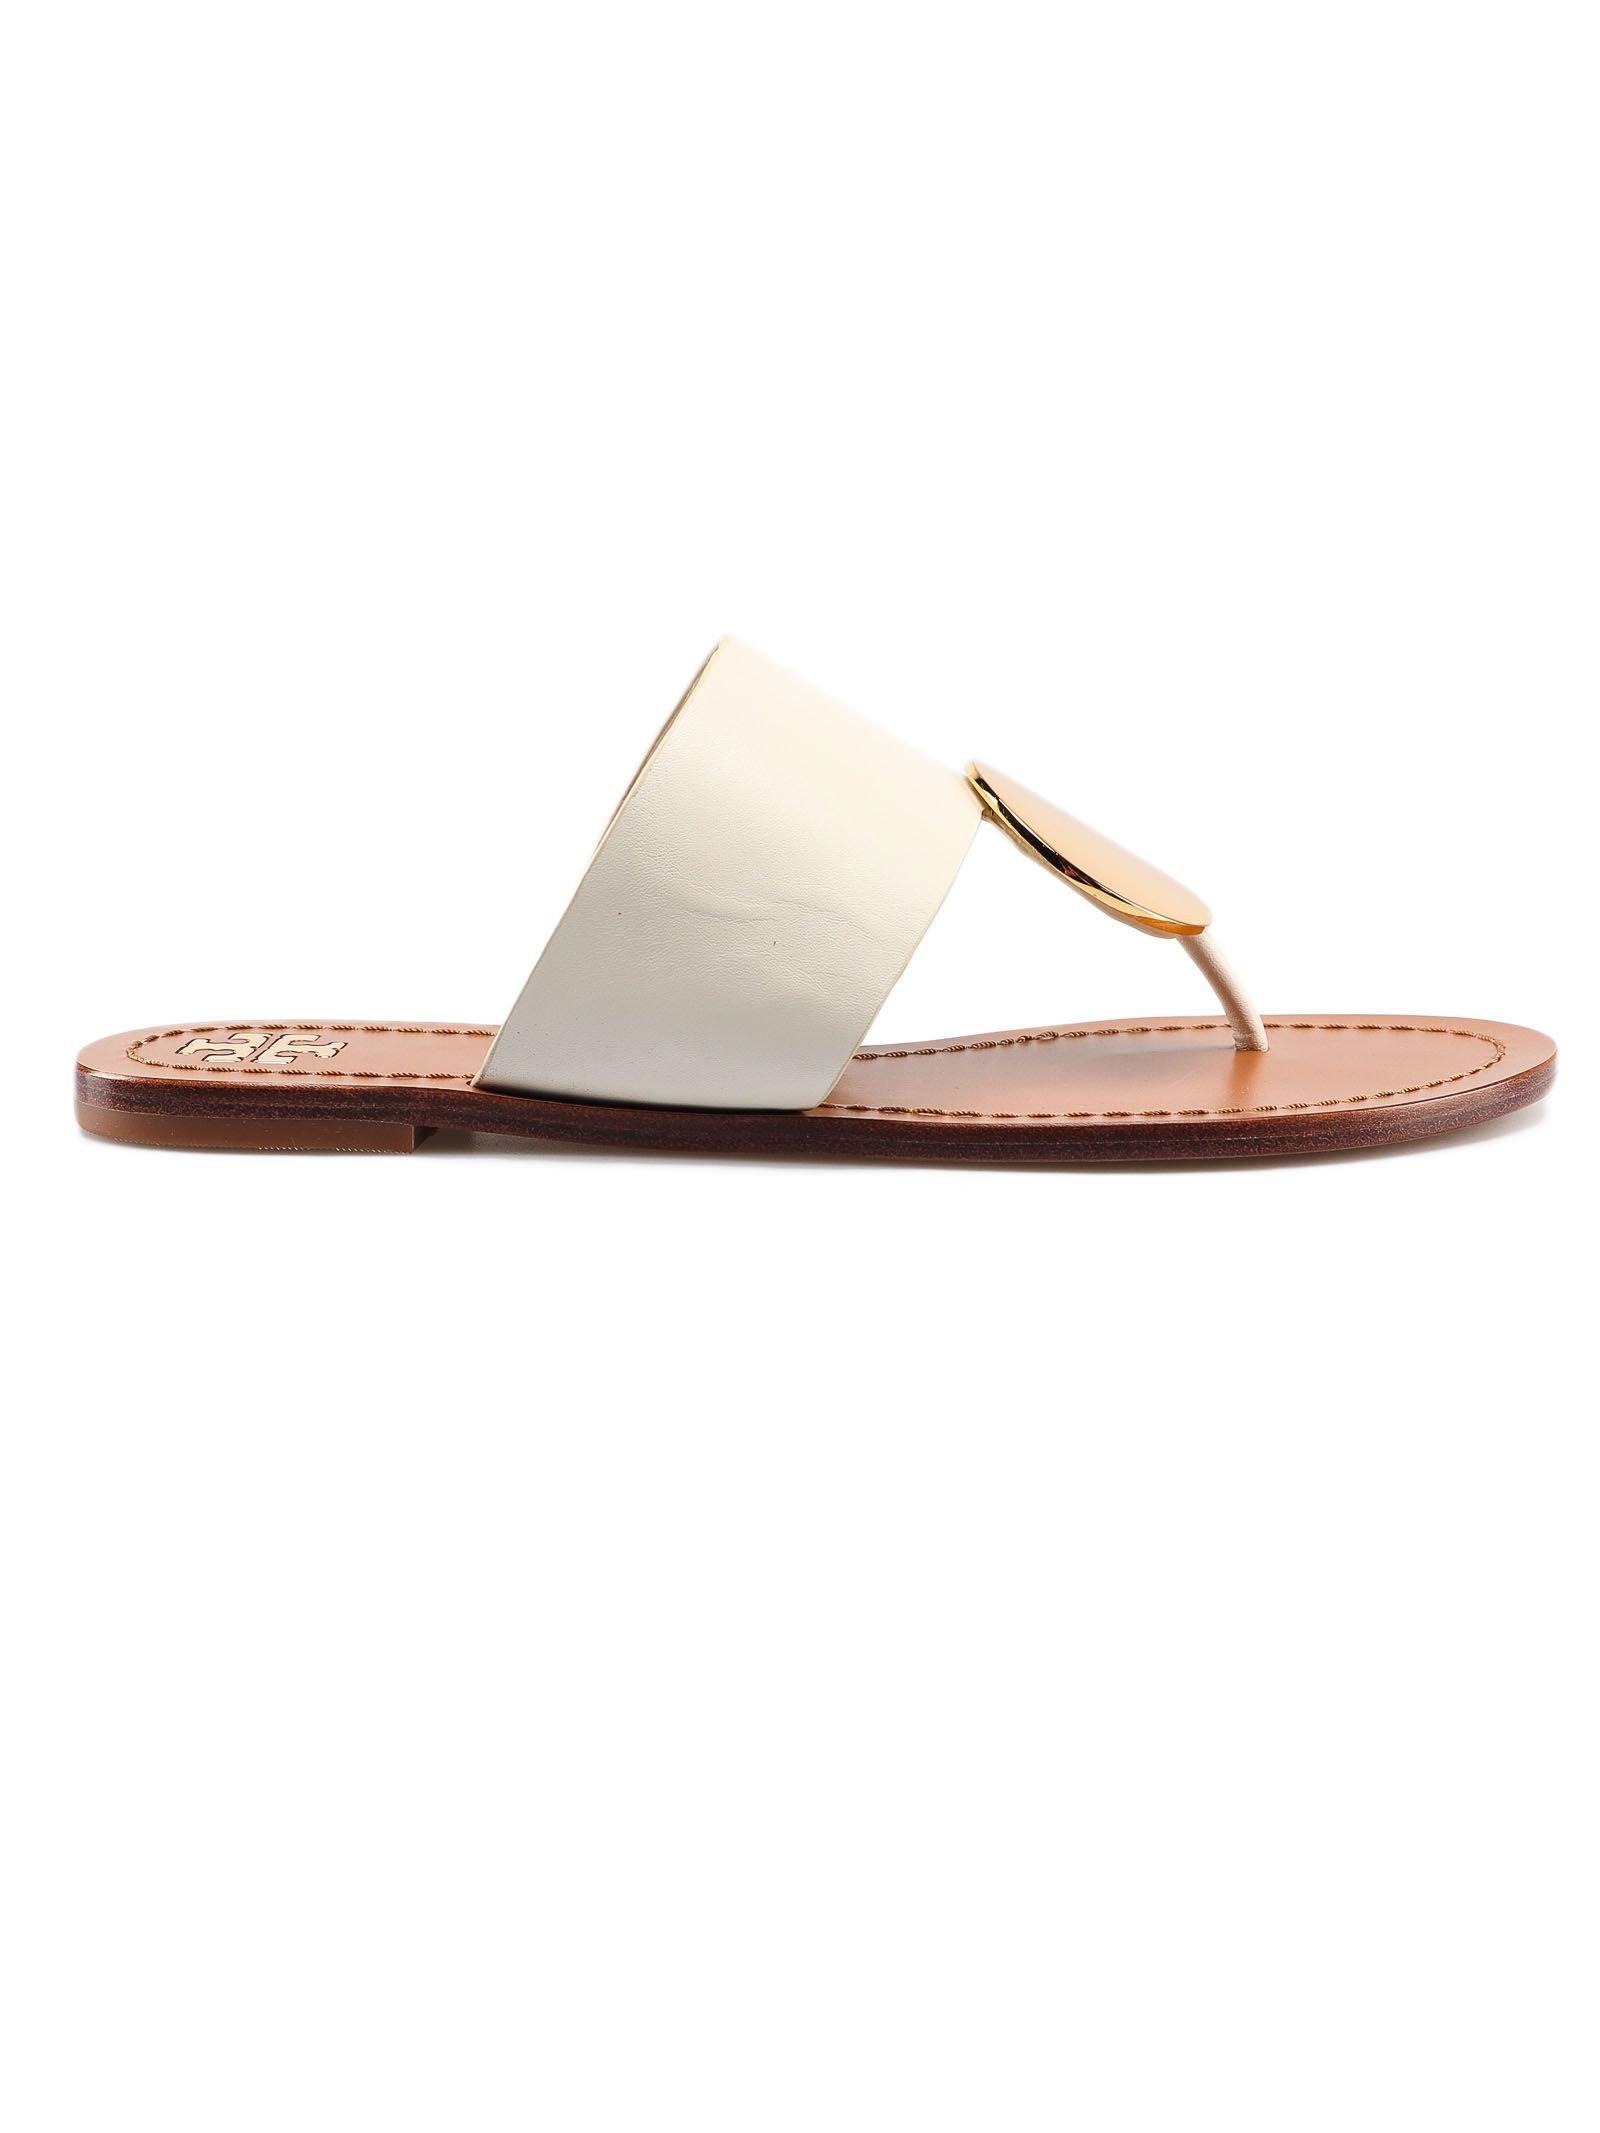 Tory Burch Disc Thong Sandals